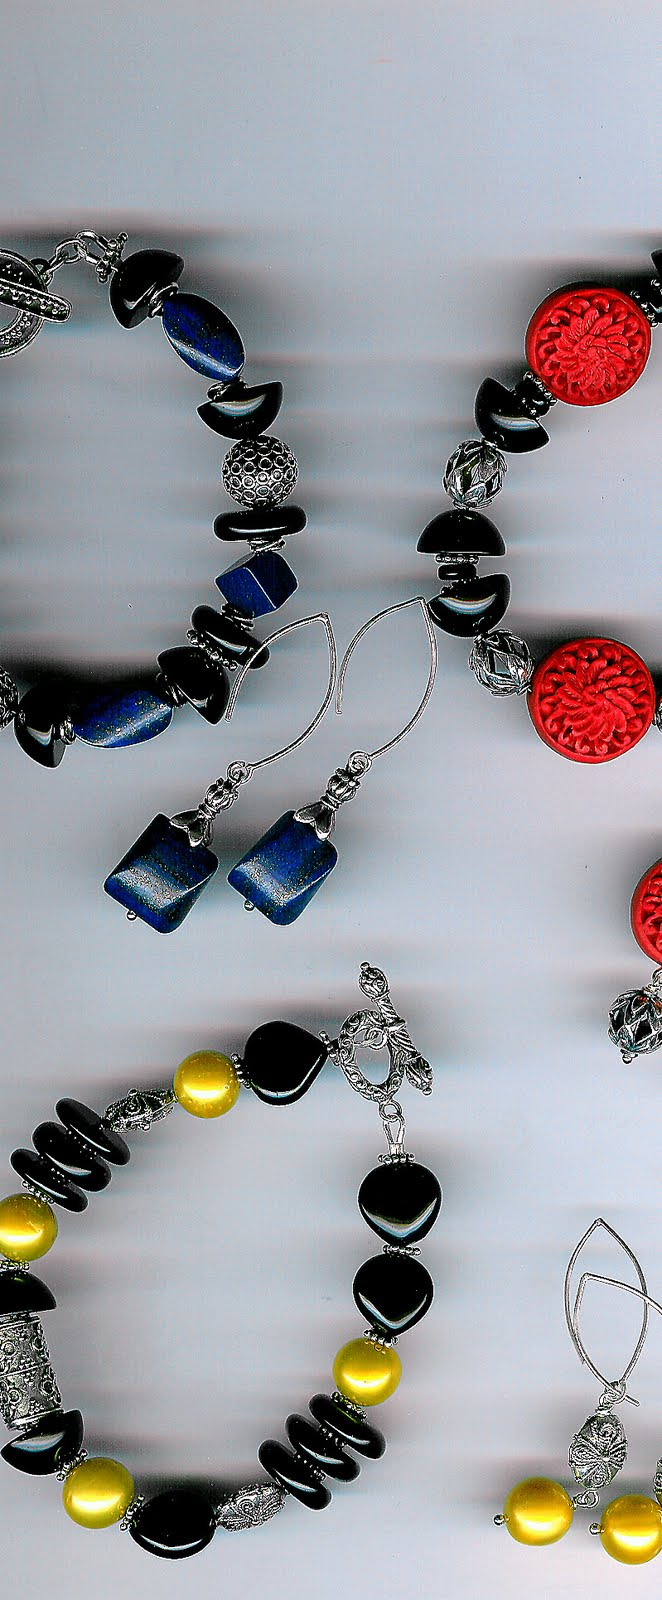 134. Cinnabar, onyx, lapis lazuli, akoya pearls with Bali Sterling Silver